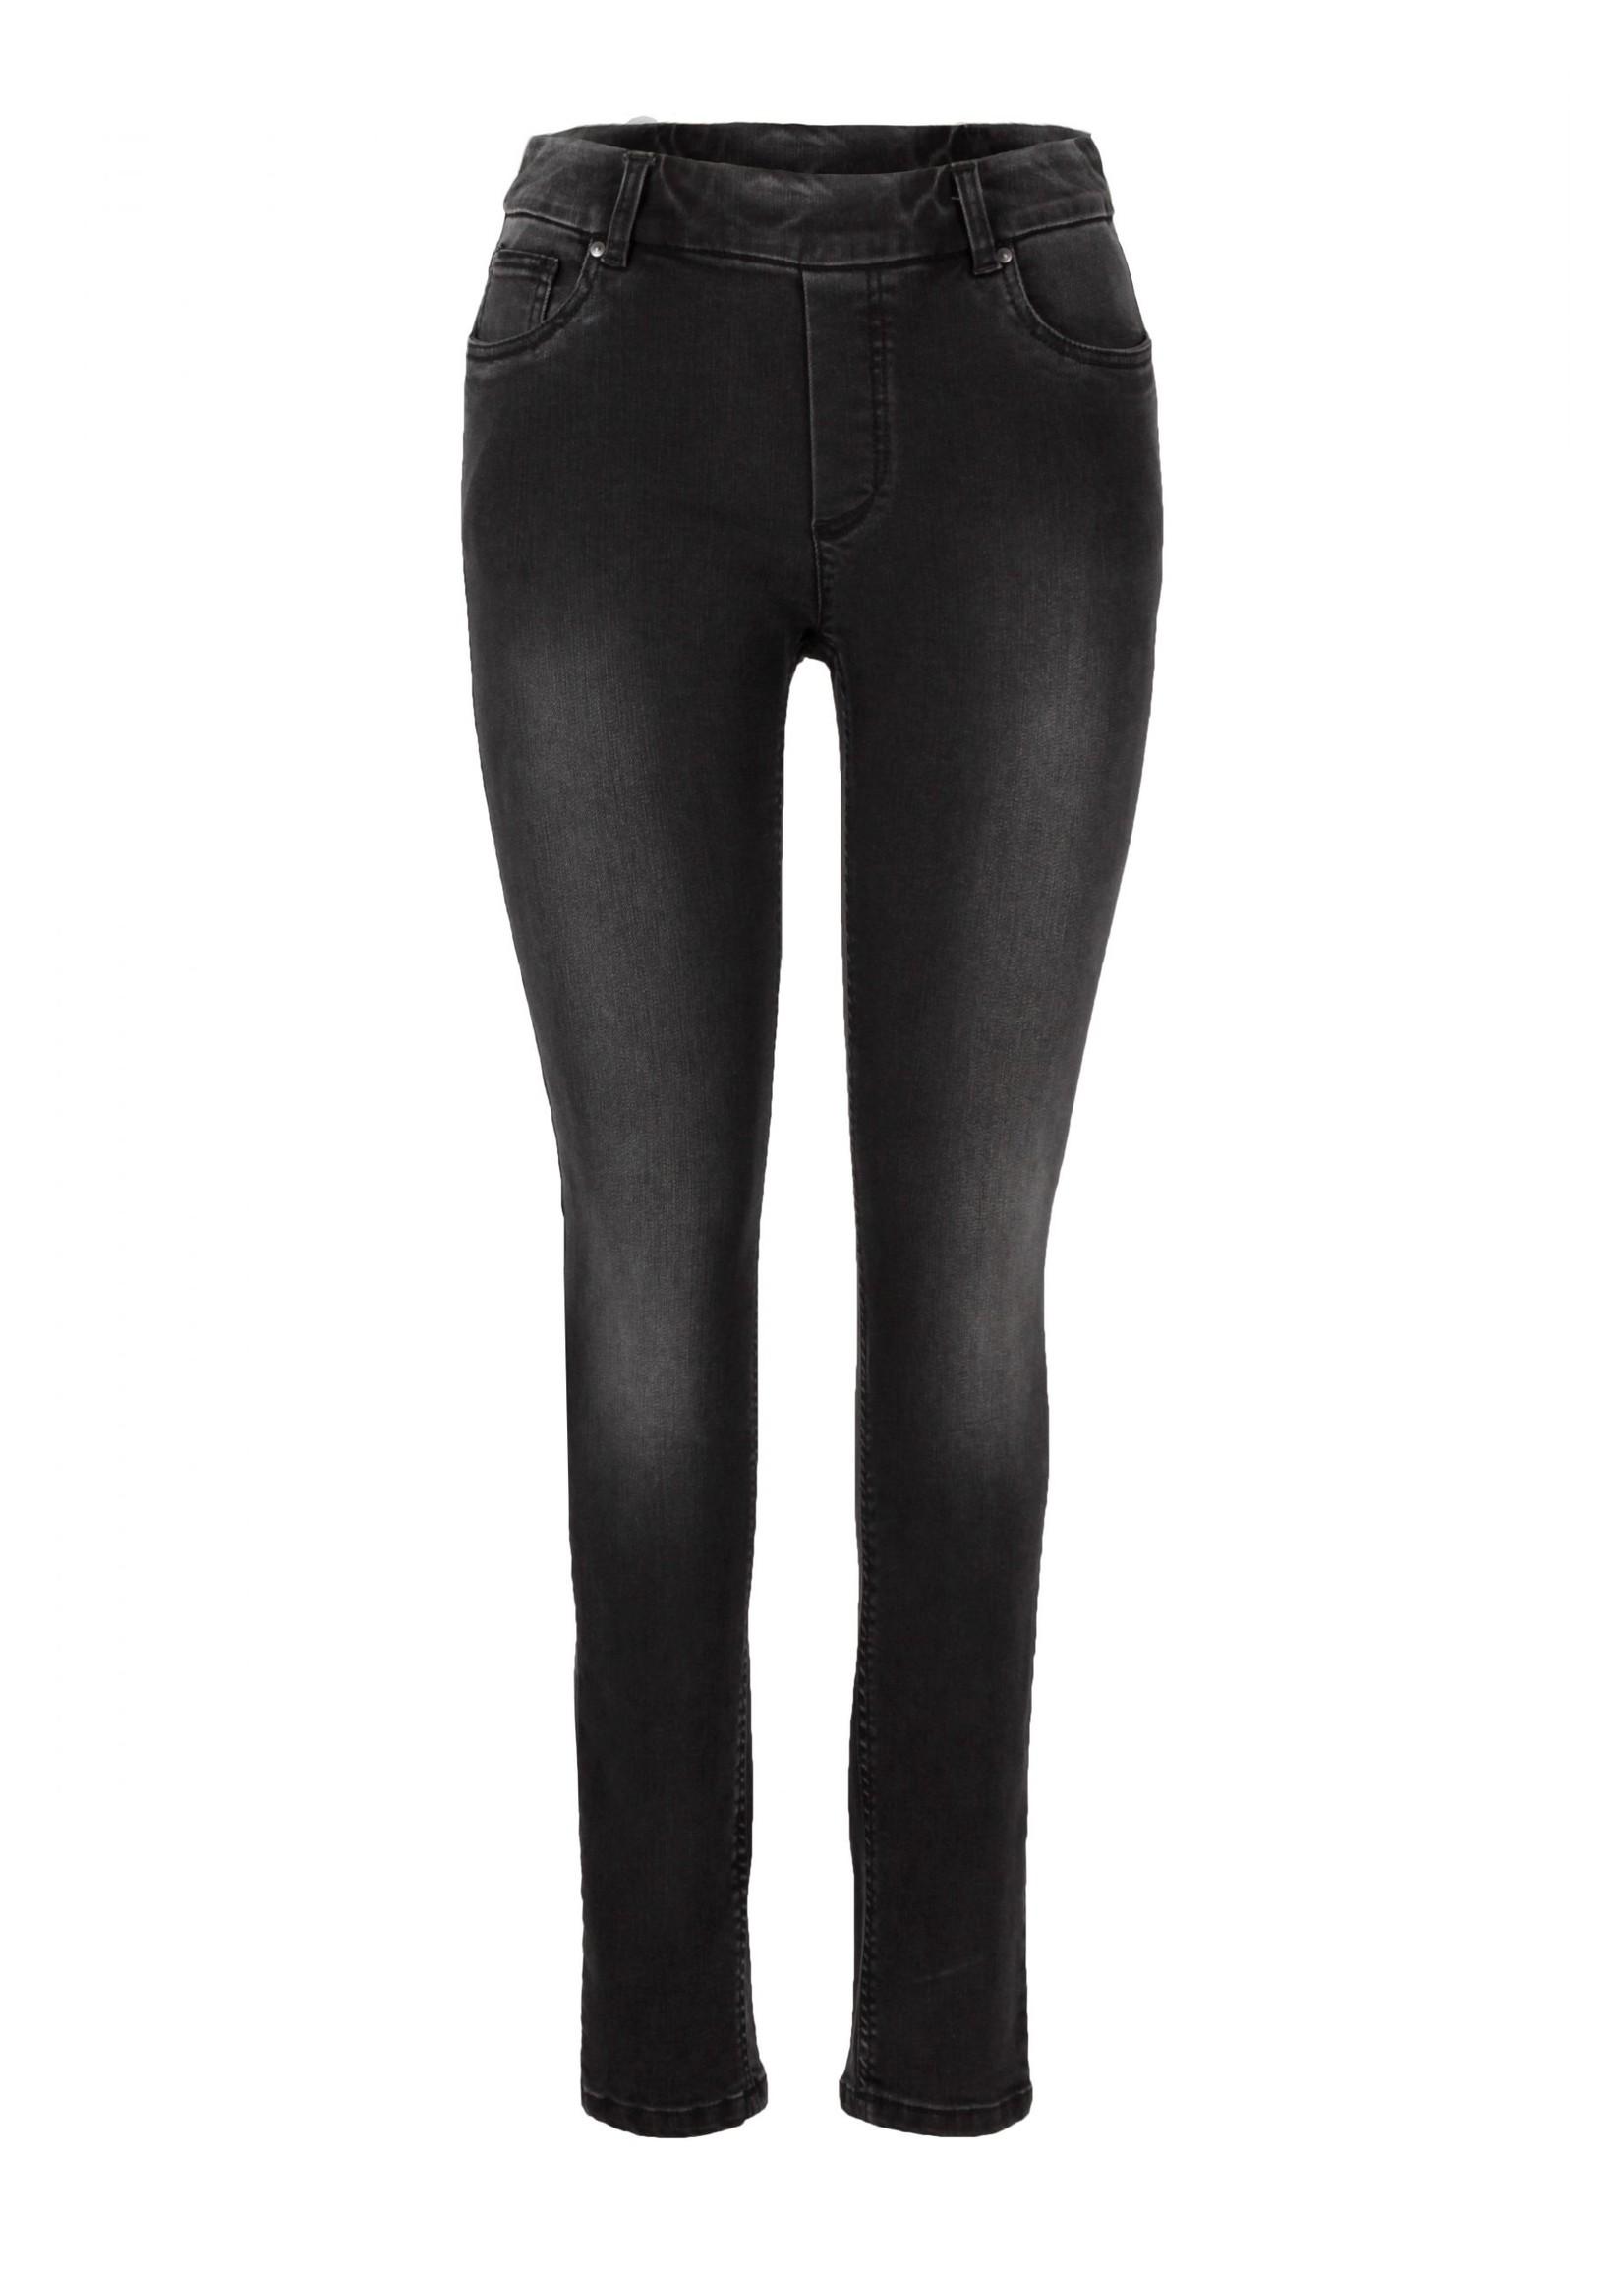 Up Pants Skinny Pull-On Denim